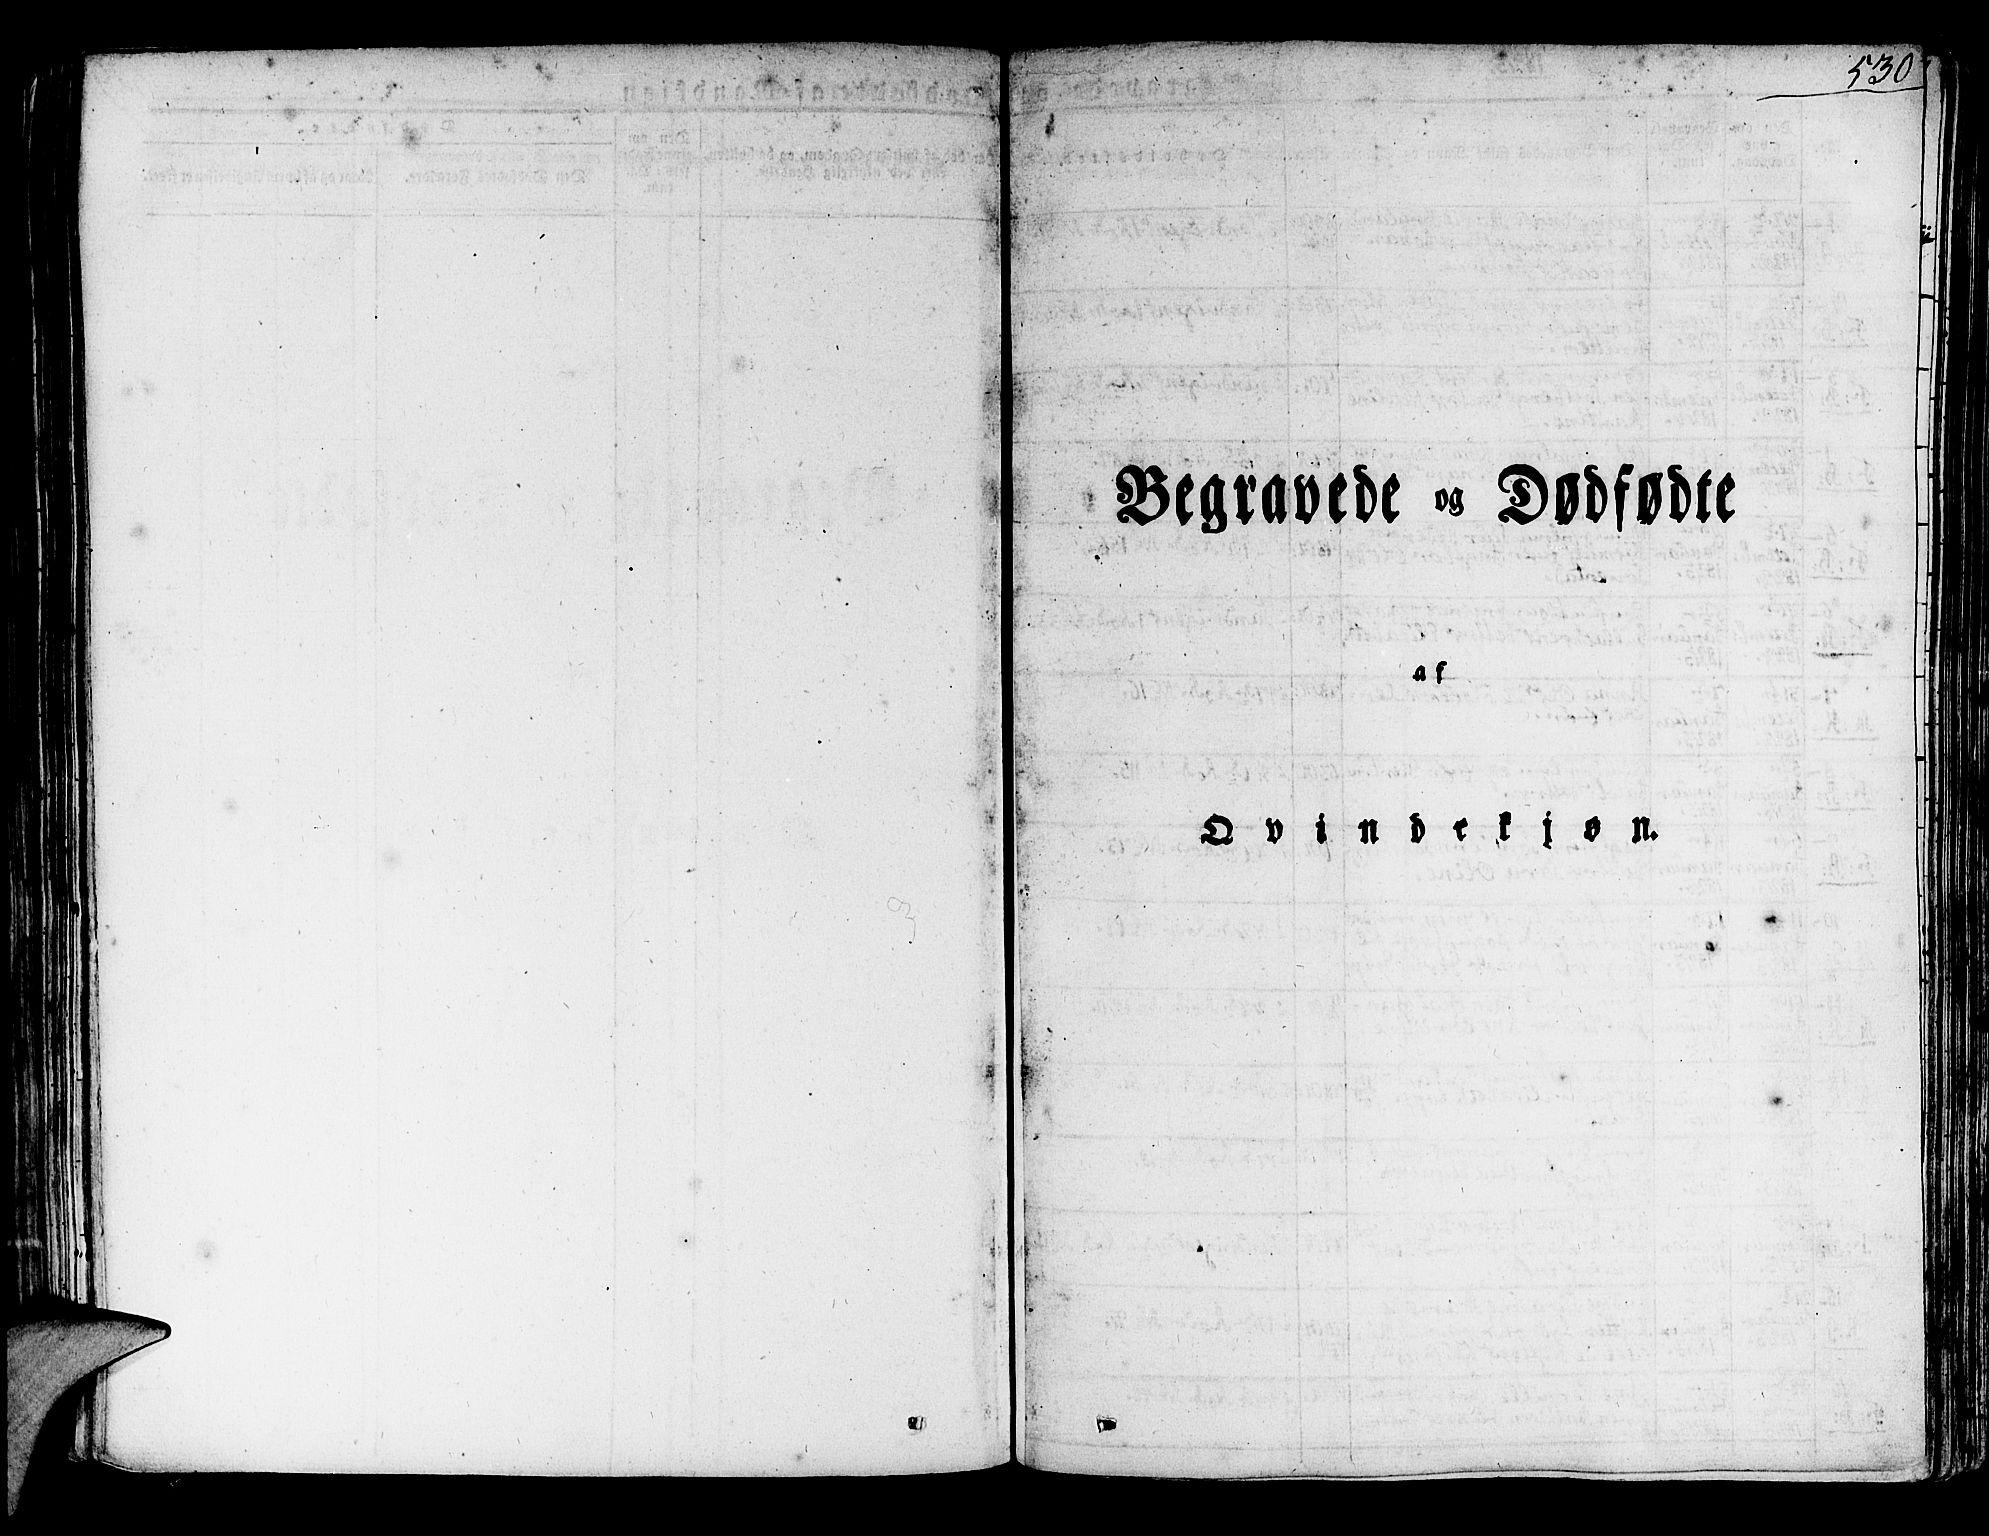 SAB, Korskirken Sokneprestembete, H/Haa/L0014: Ministerialbok nr. A 14, 1823-1835, s. 530